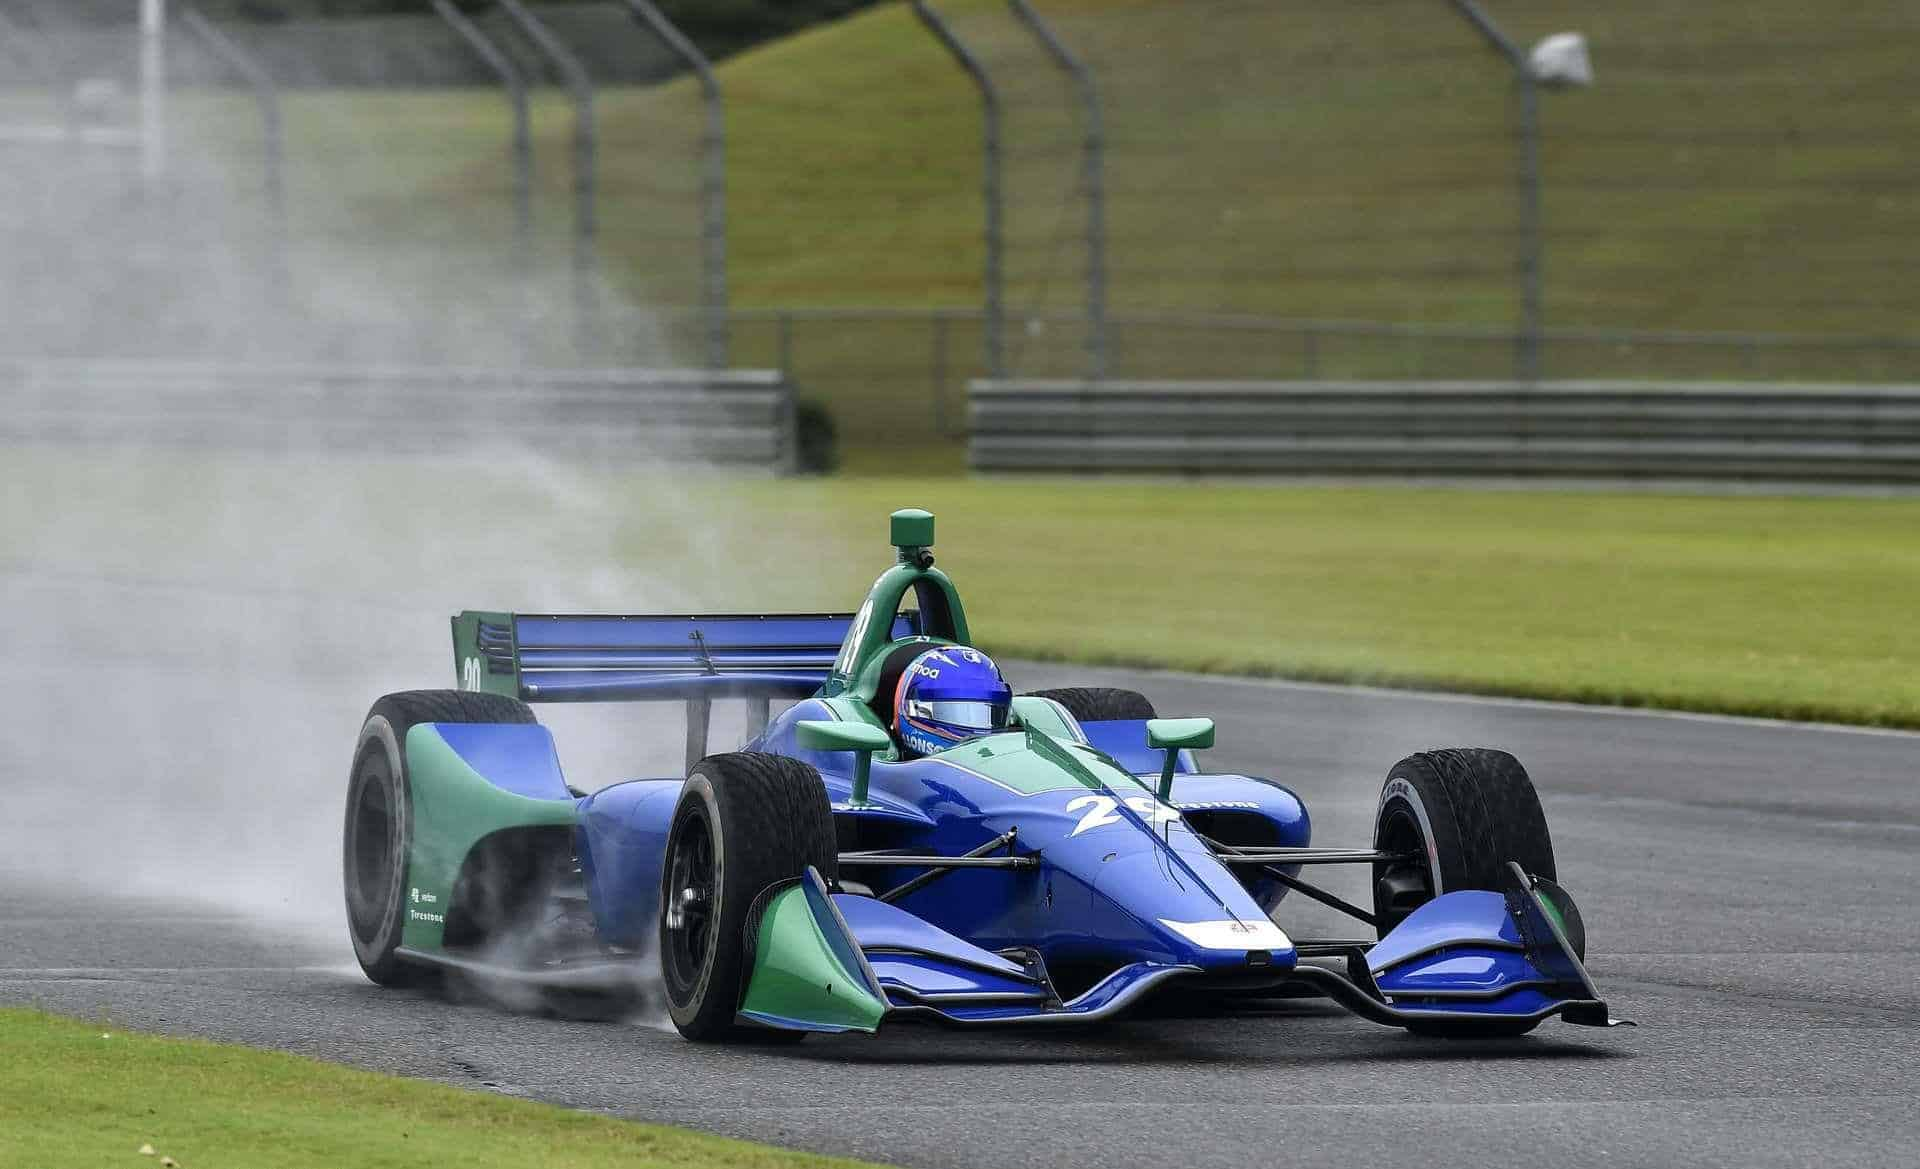 Alonso Indycar 2018 test Barber on the track wet Photo IndyCar